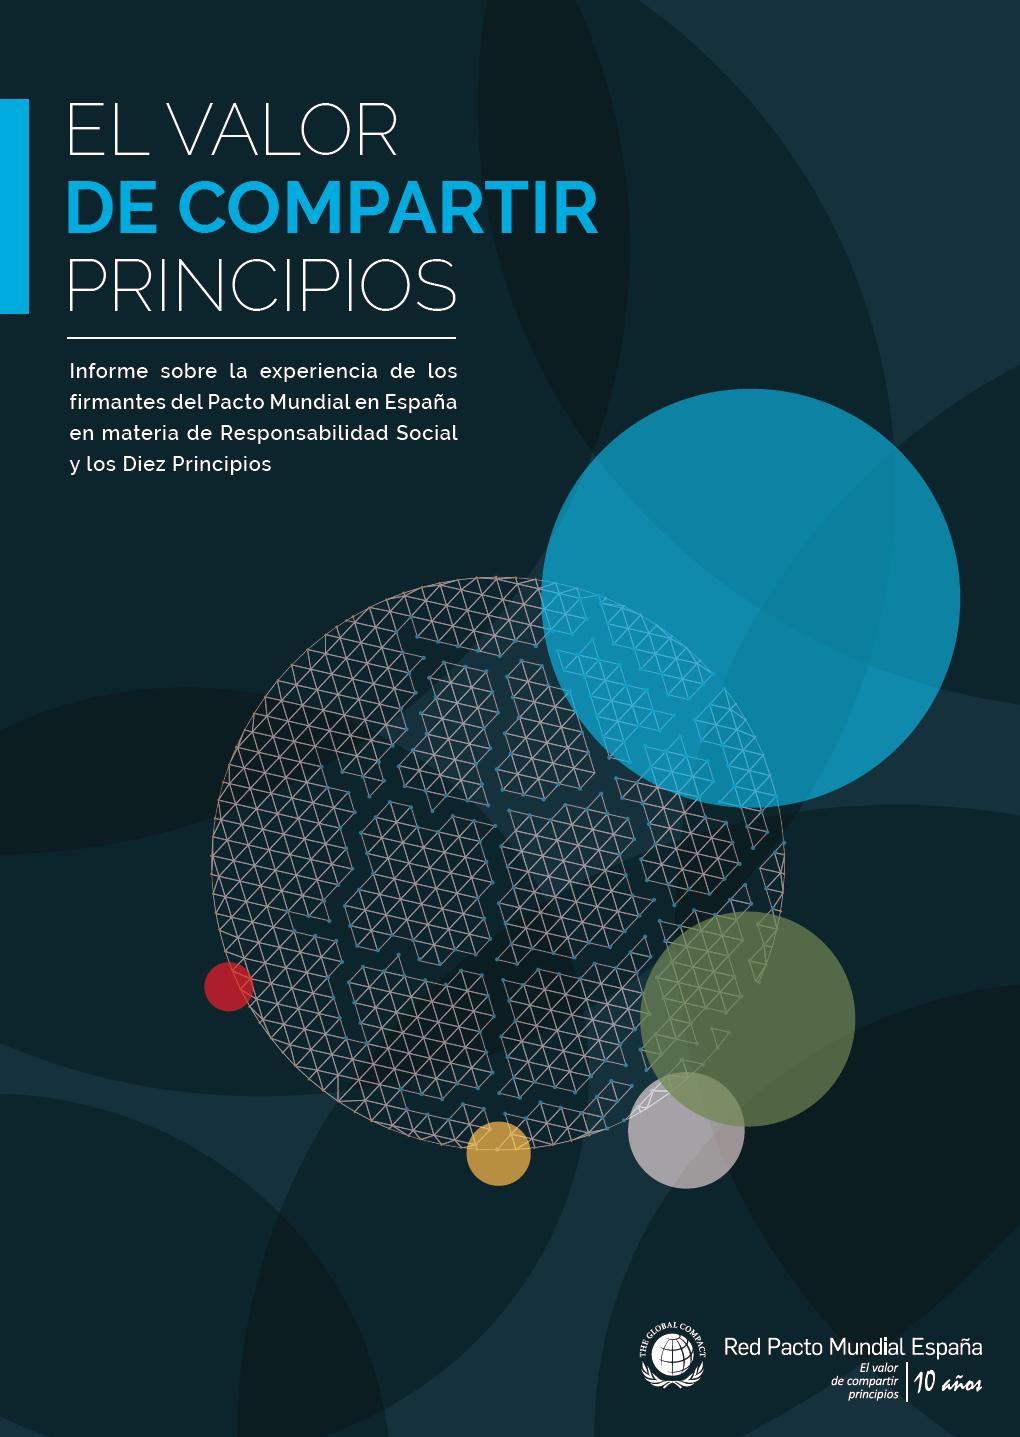 El valor de compartir principios - Informe RSE de Pacto Mundial España